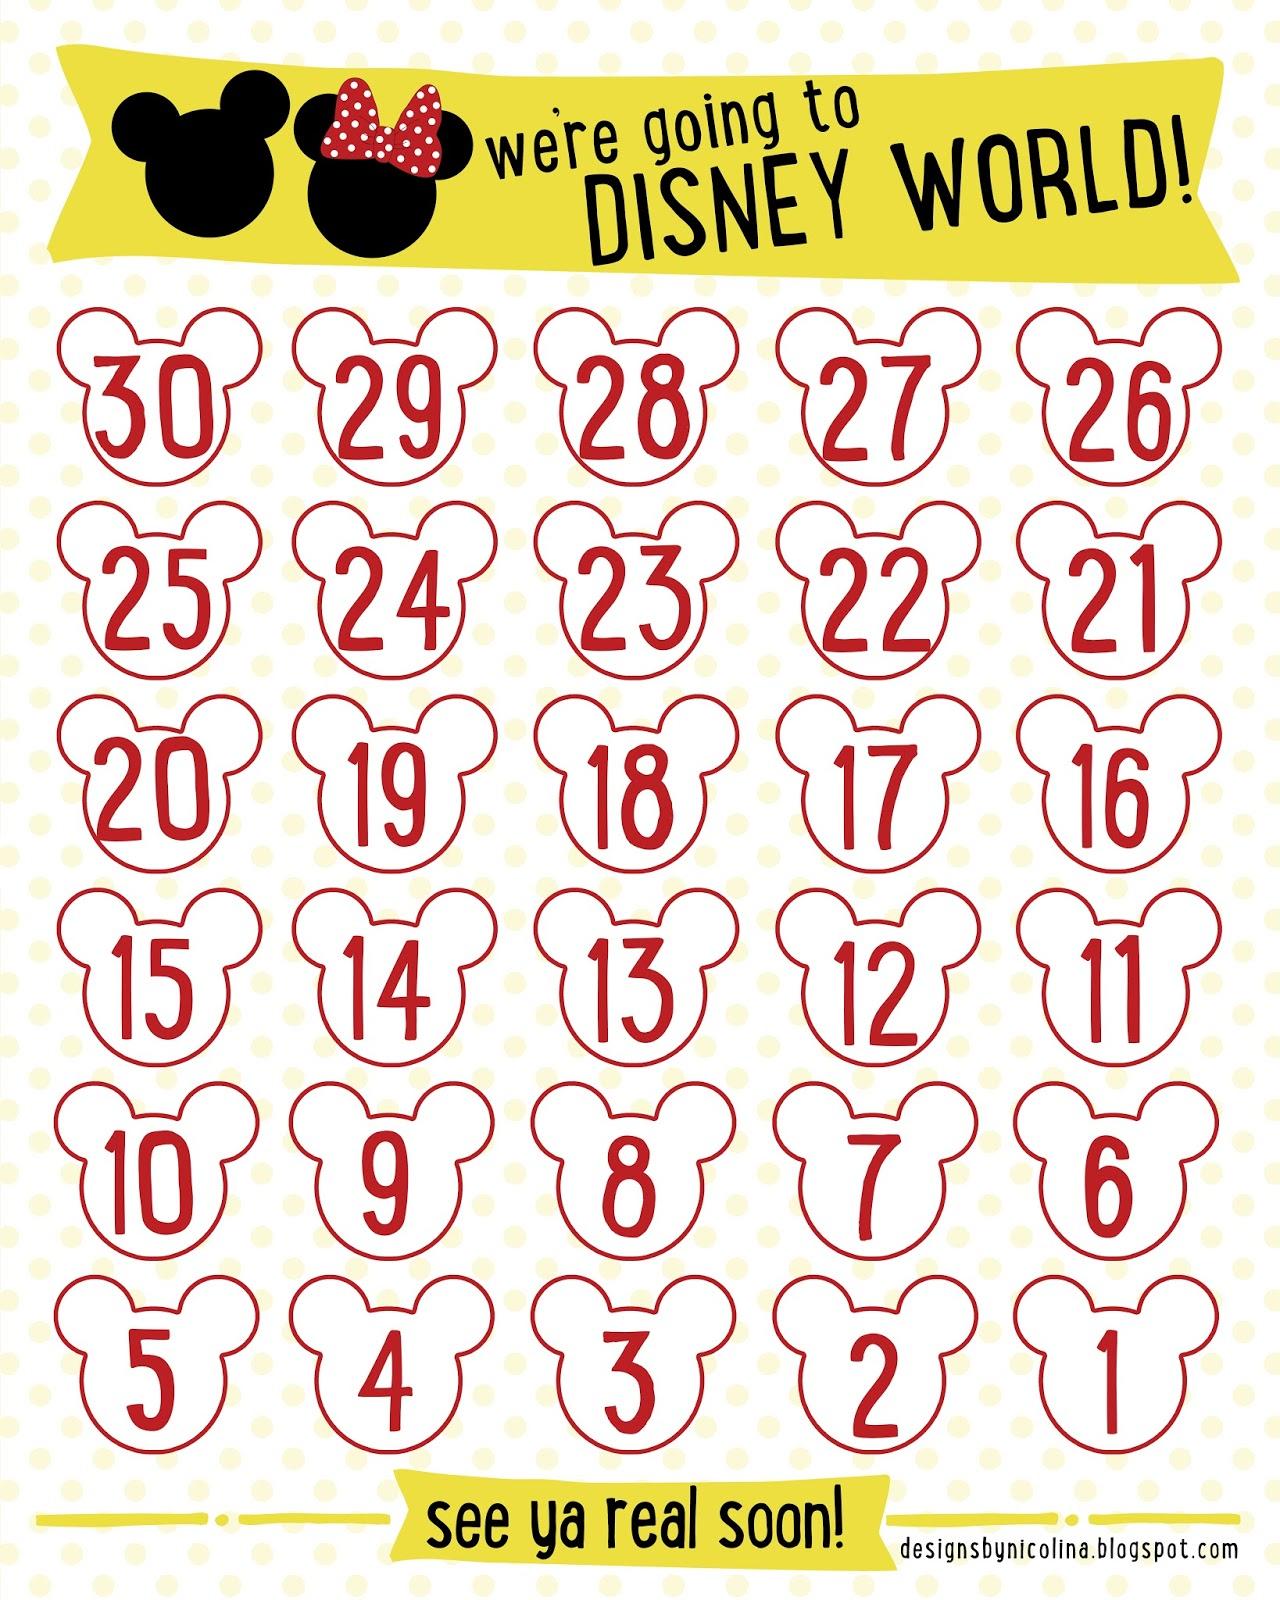 Designsnicolina: Disney Countdown! /// Free Printable ///